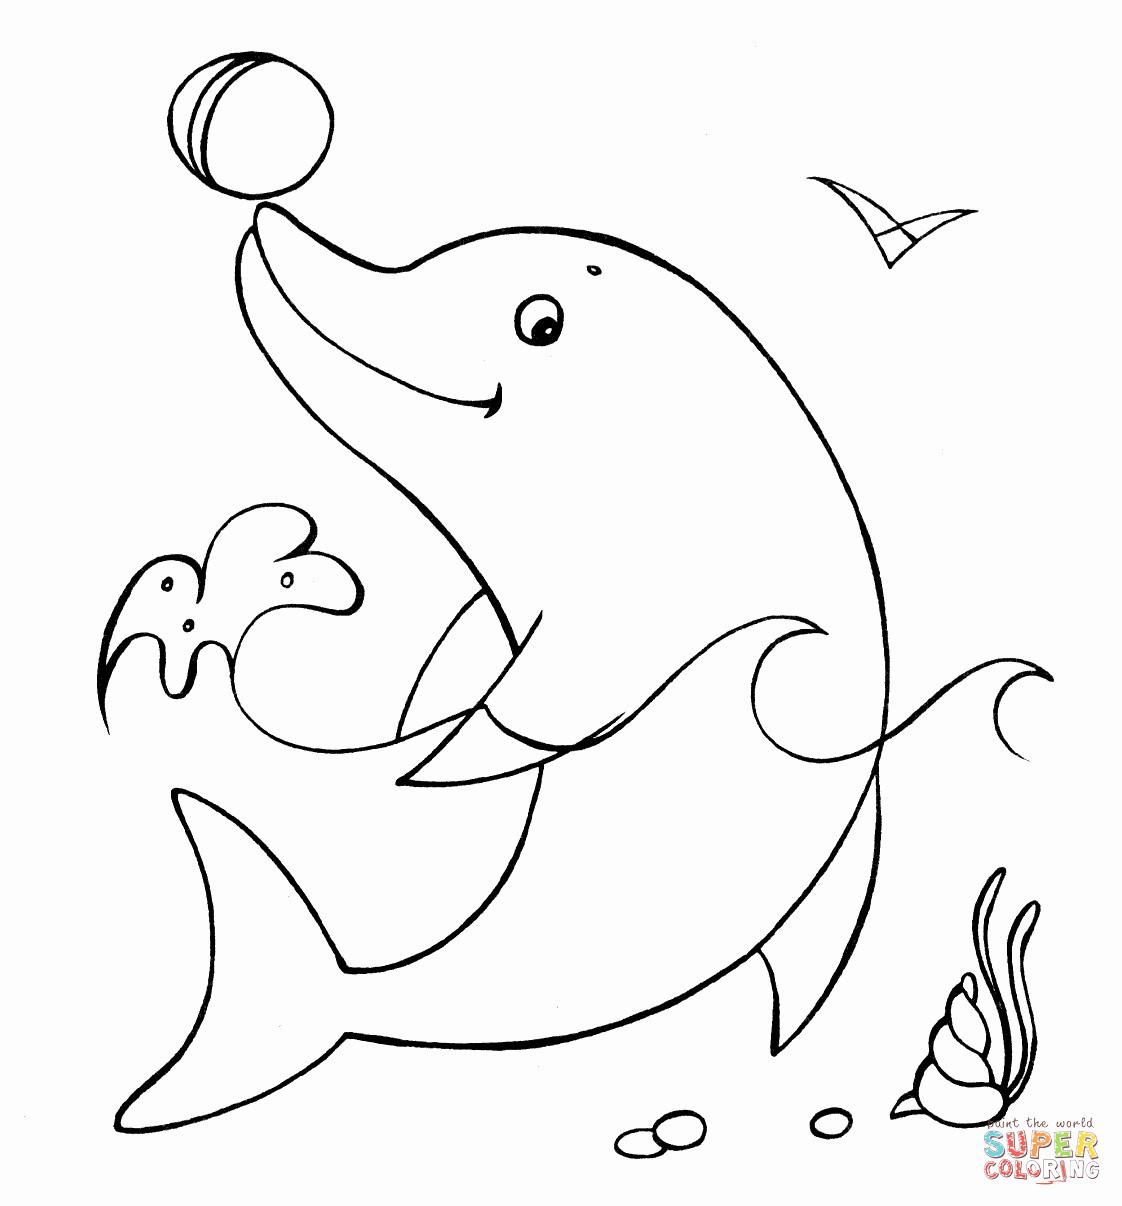 Ausmalbilder Delphine Zum Ausdrucken Neu Delfin Bilder Zum Ausdrucken Luxus 43 Ausmalbilder Tiere Delphin Fotografieren